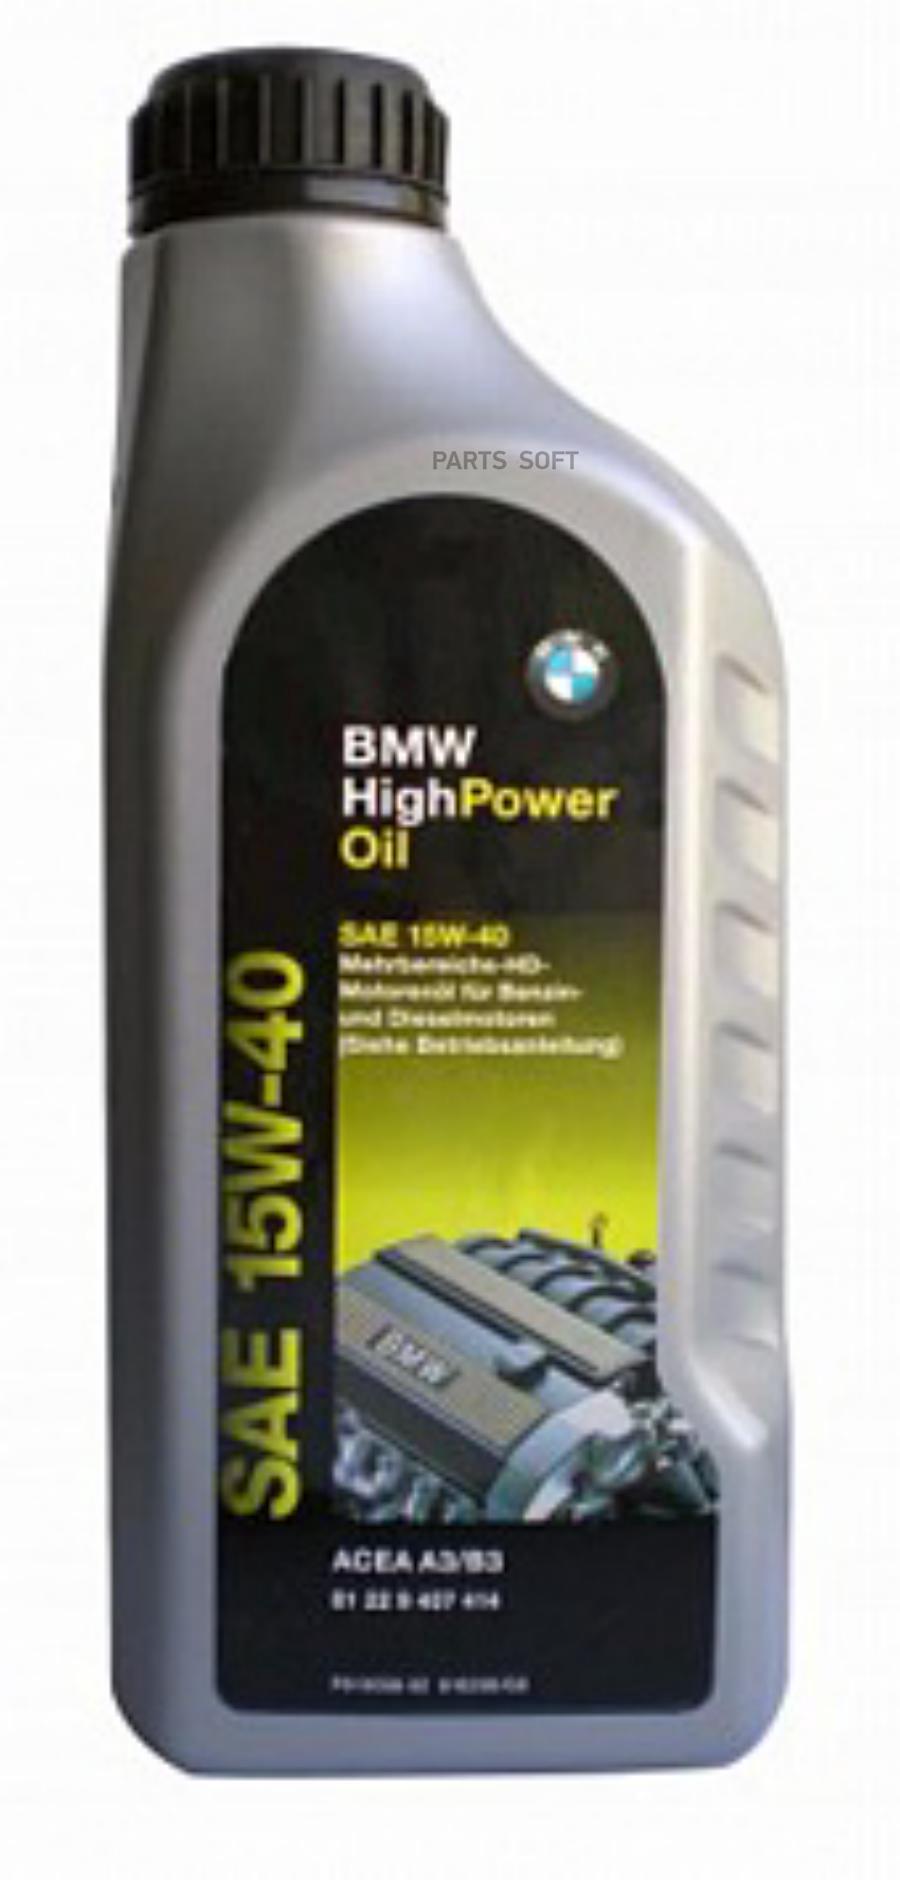 BMW HIGH POWER OIL .